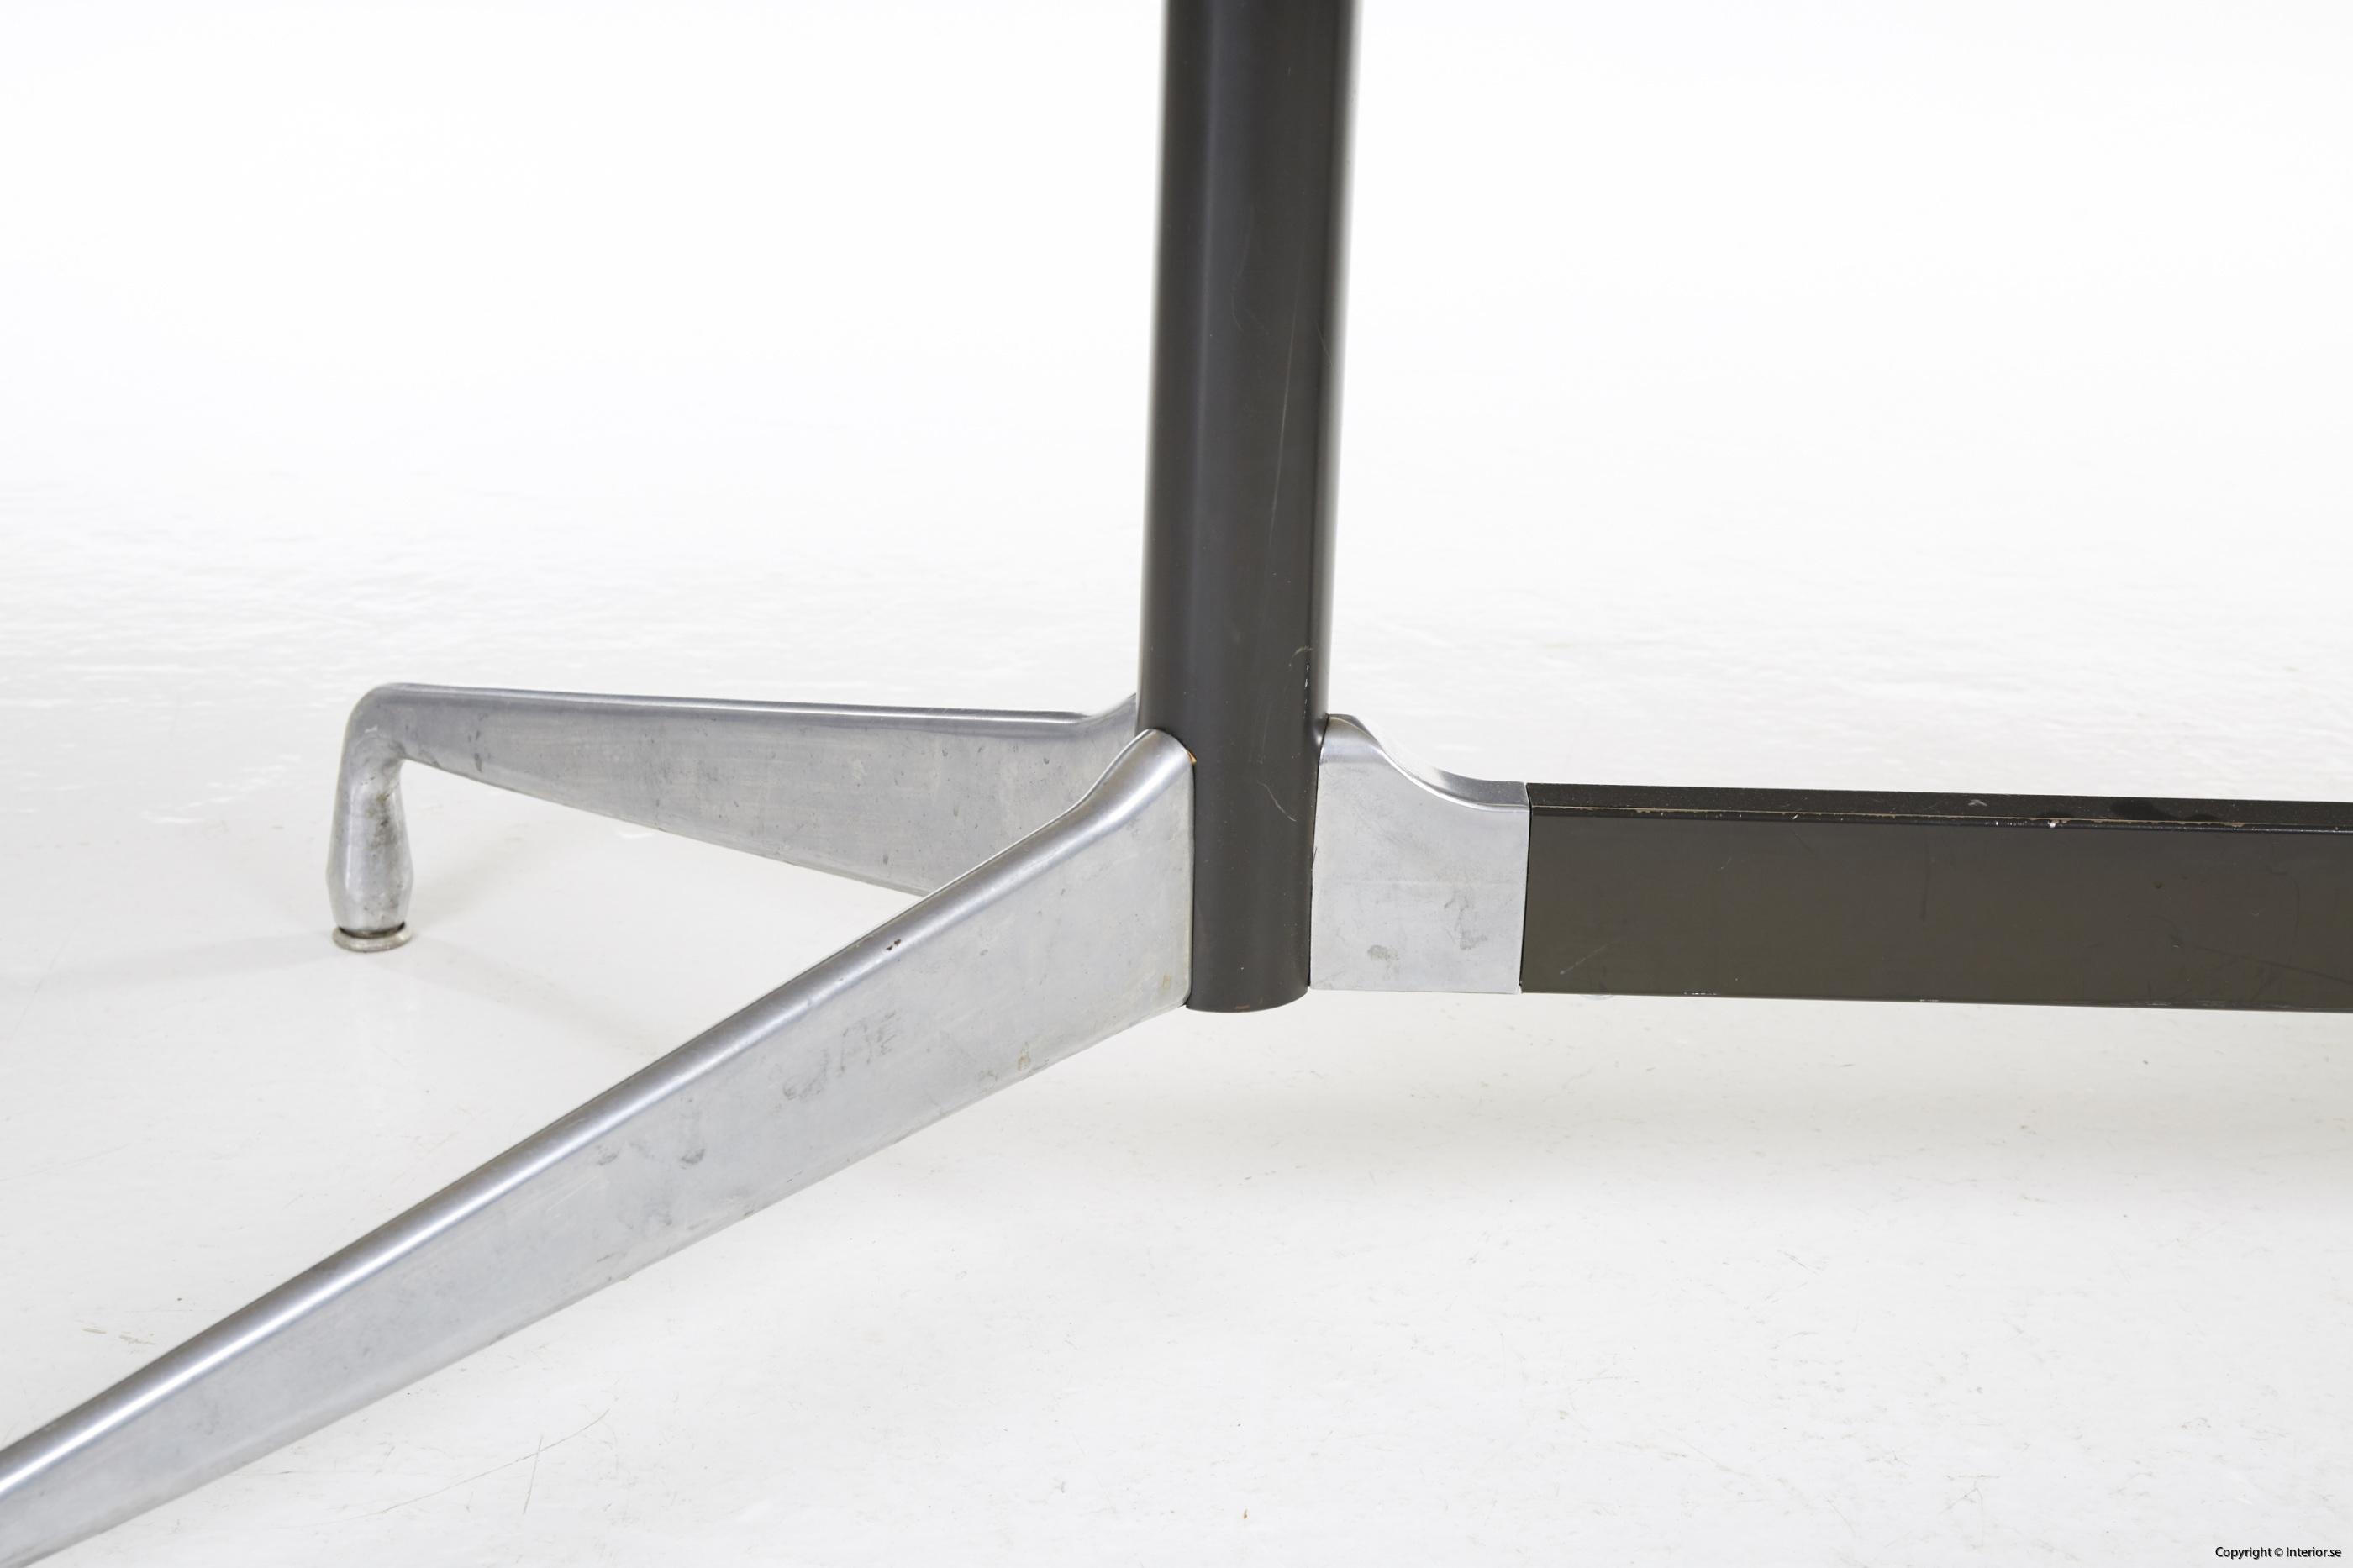 Skrivbord desk schreibtisch Herman Miller Segmented Table - Eames Vintage 4